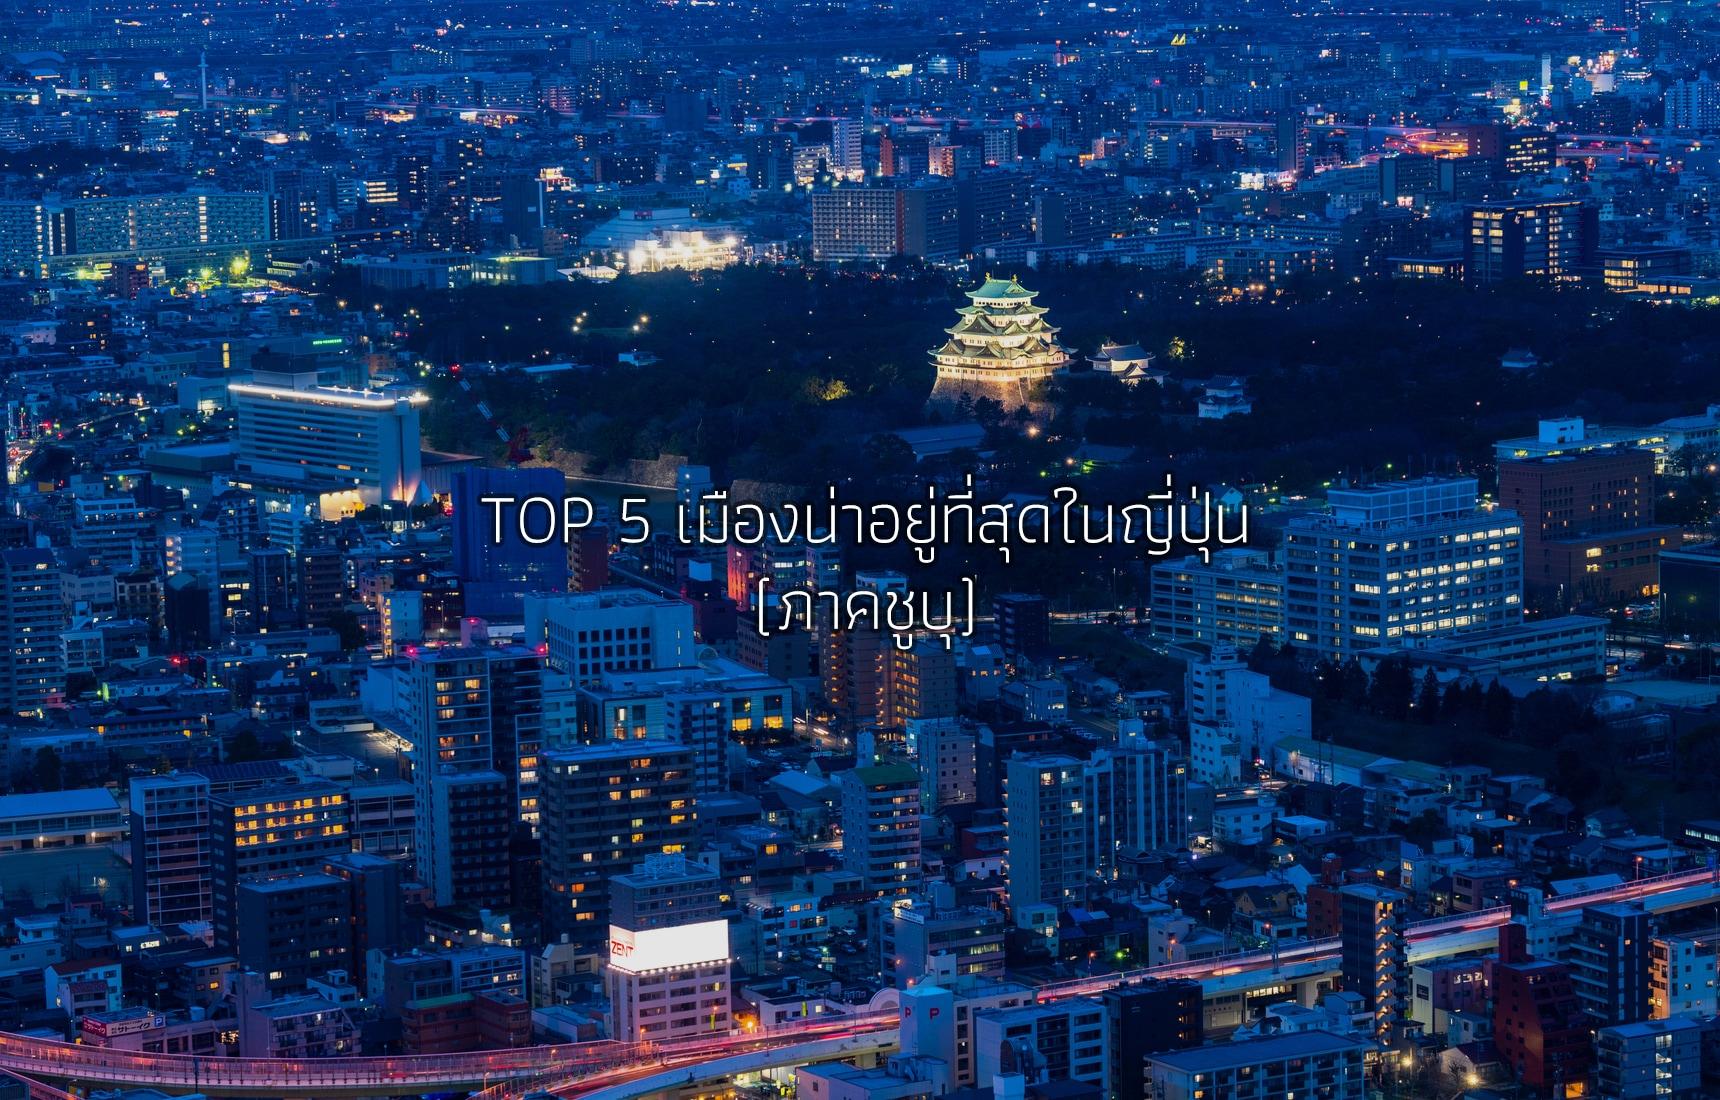 TOP 5 เมืองน่าอยู่ที่สุดในญี่ปุ่น (ภาคชูบุ)